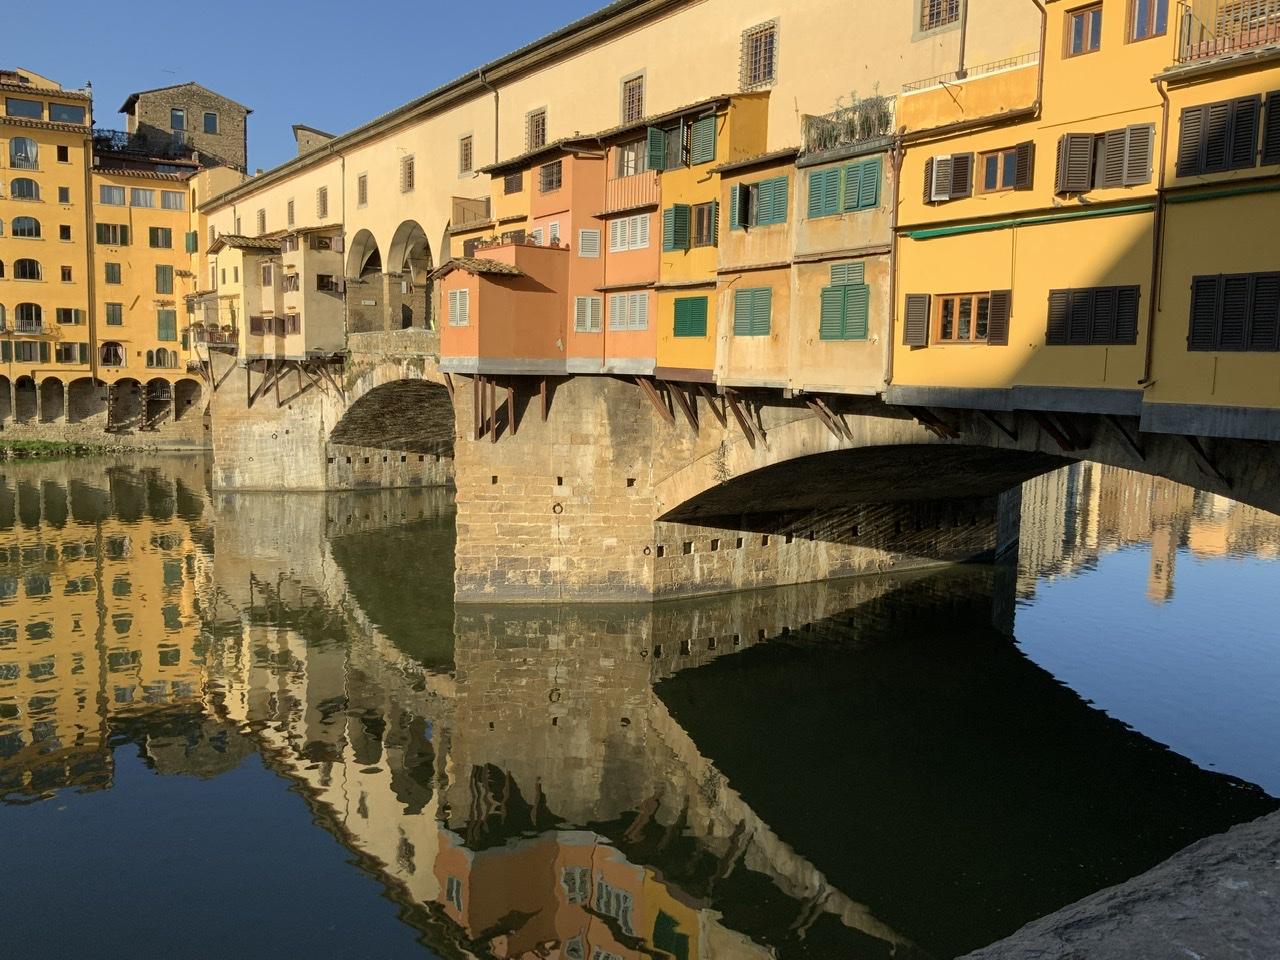 Firenze giretto